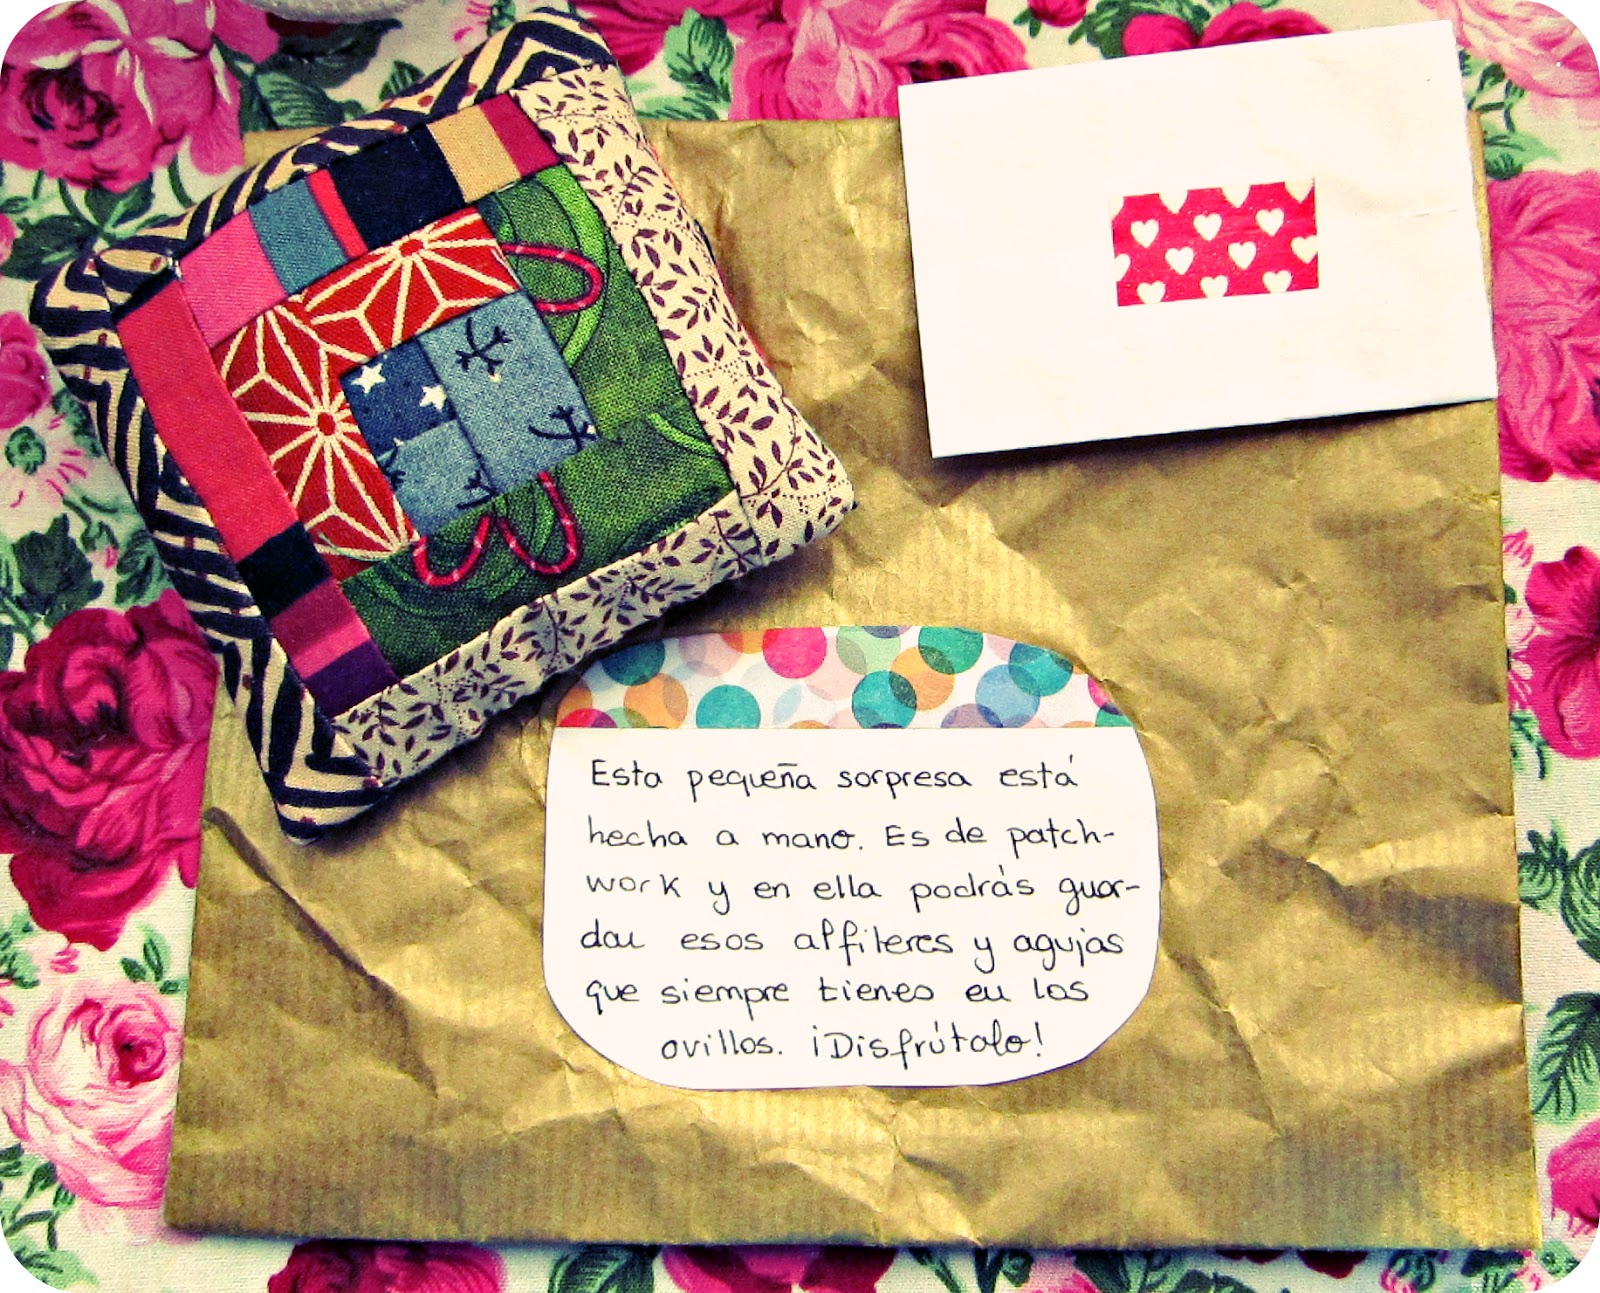 http://lluevediamantina.blogspot.mx/2013/01/yo-correo.html